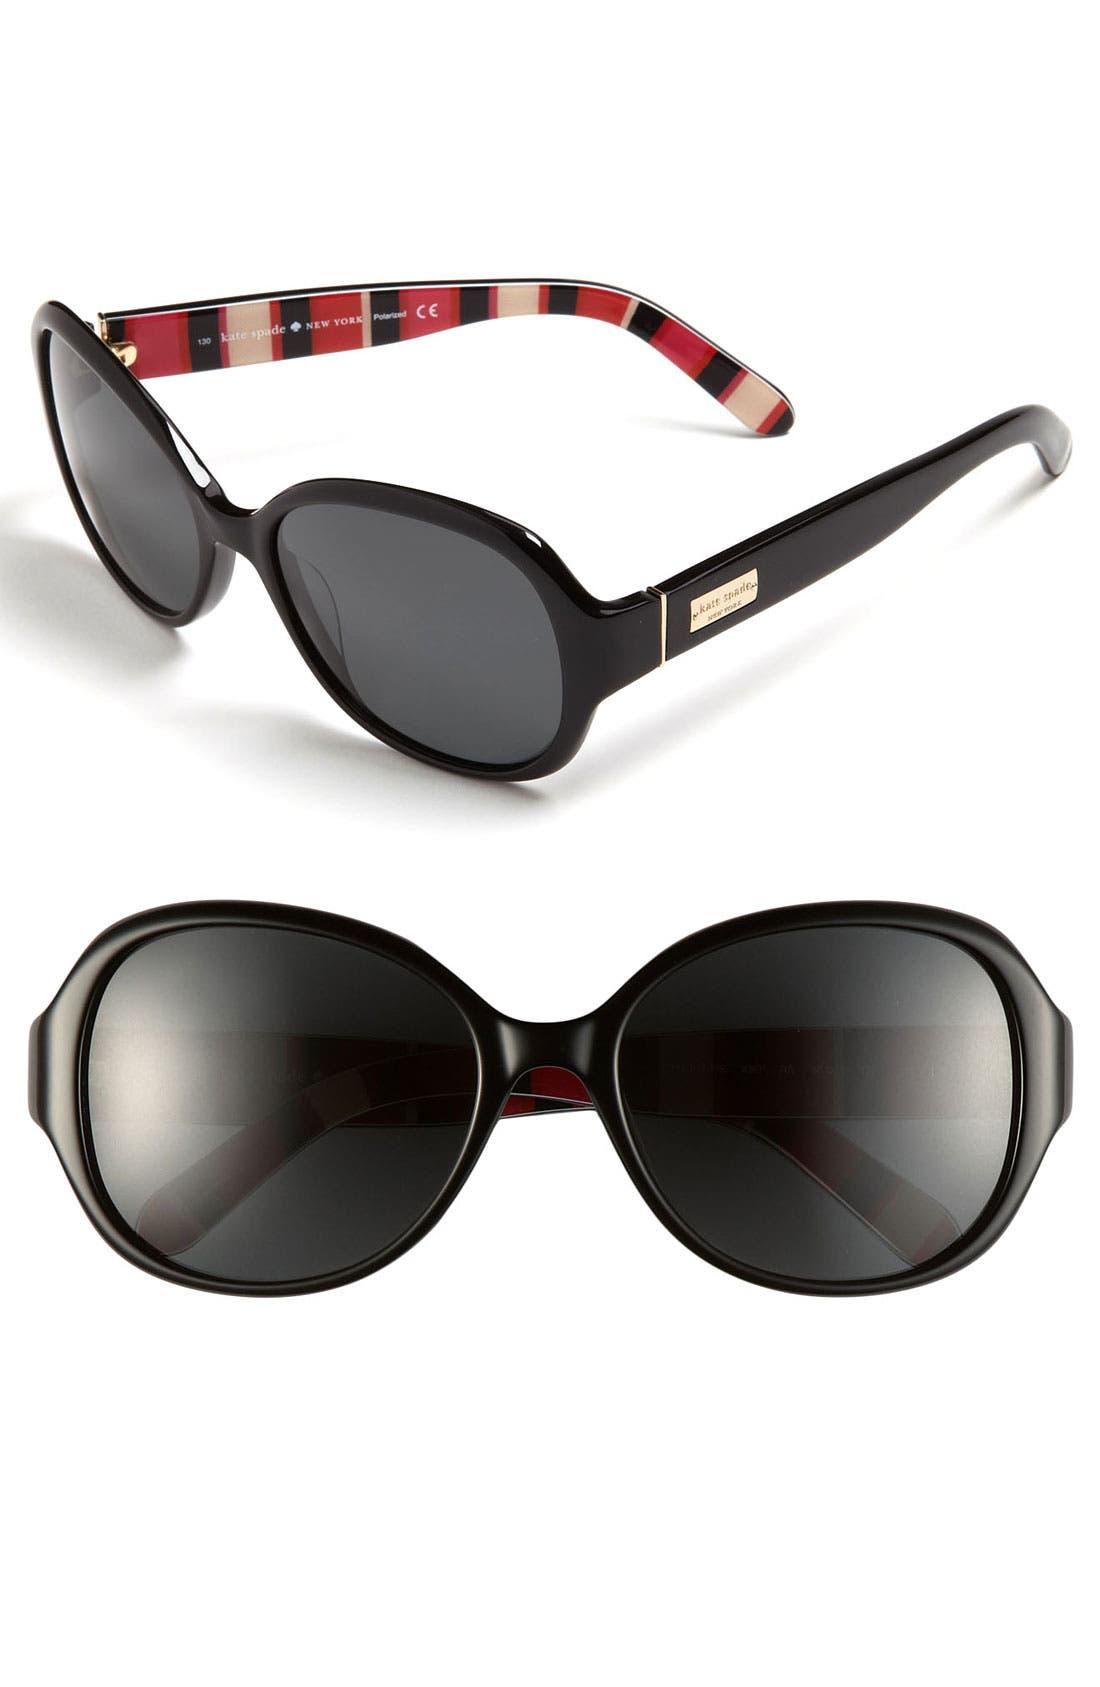 Main Image - kate spade new york 'cymone' 55mm polarized sunglasses